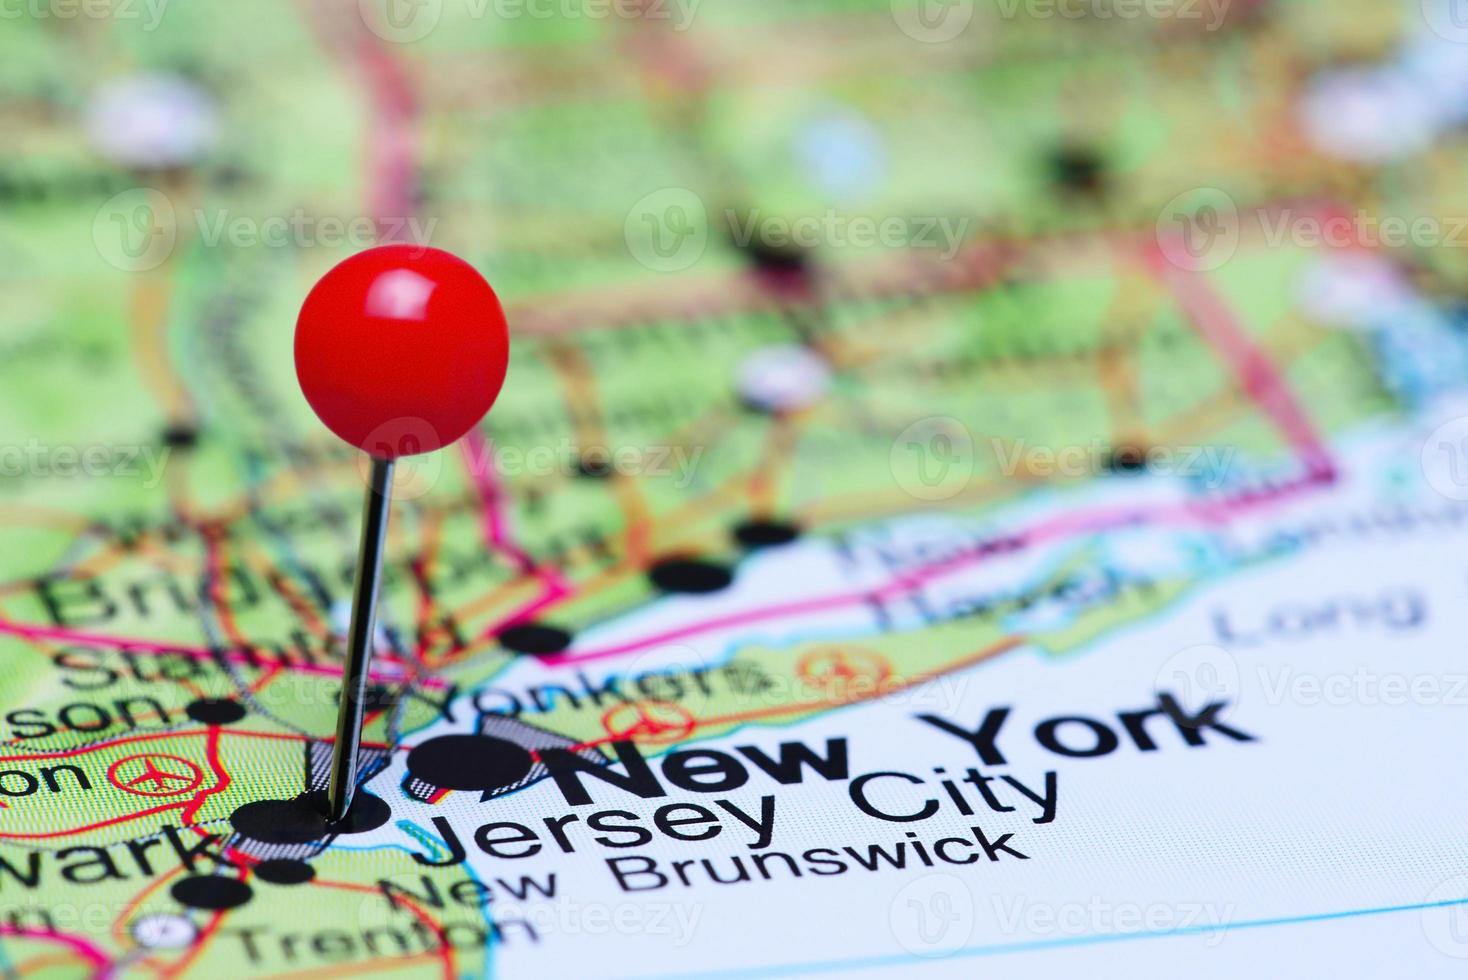 Jersey City pinned on a map of USA photo